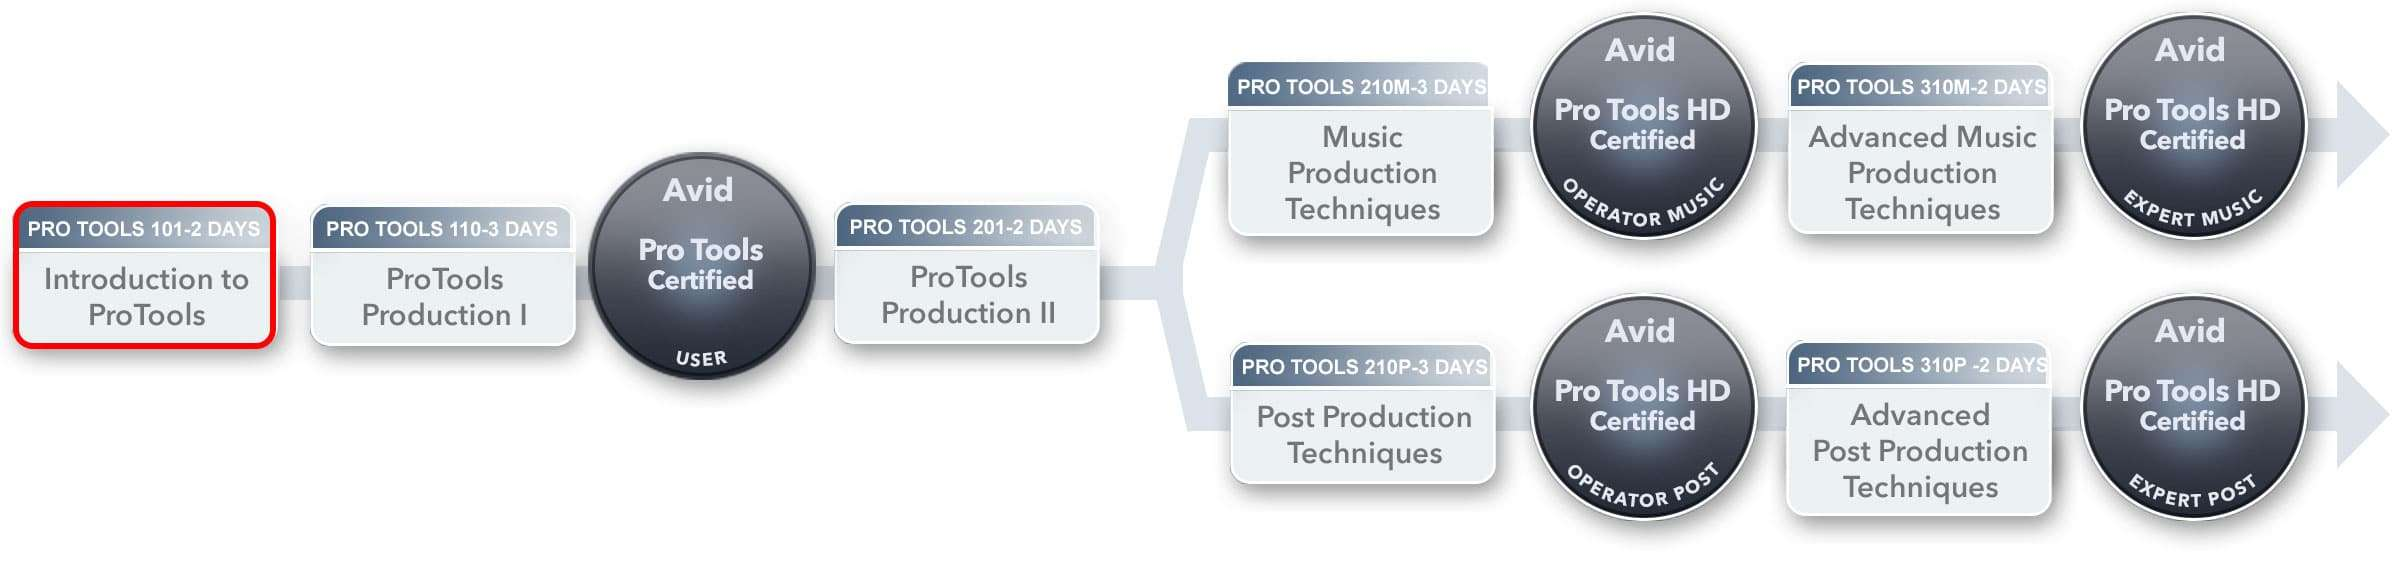 Pro-Tools-path-101-12